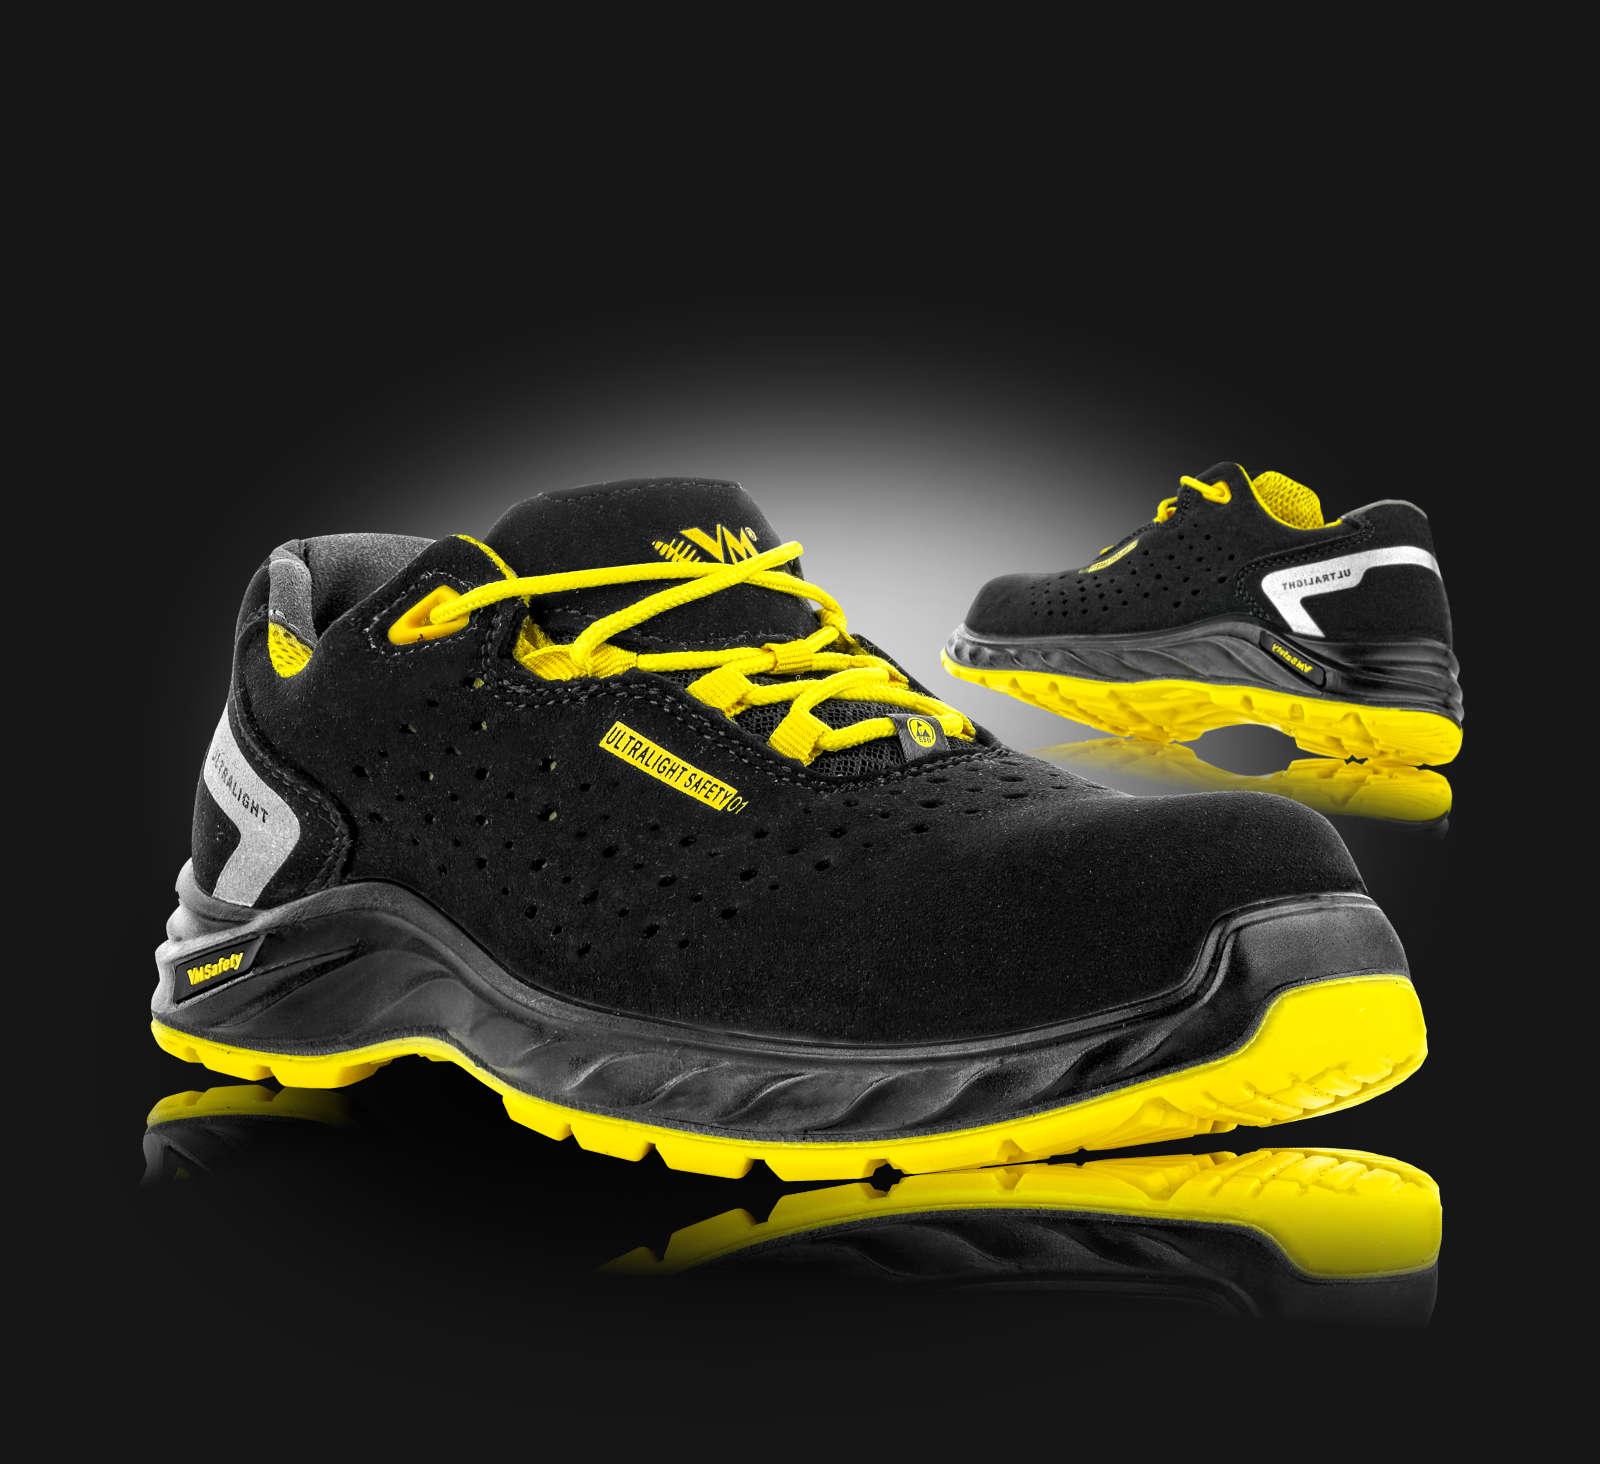 2285-S1 ESD CHICAGO obuv prac. 38